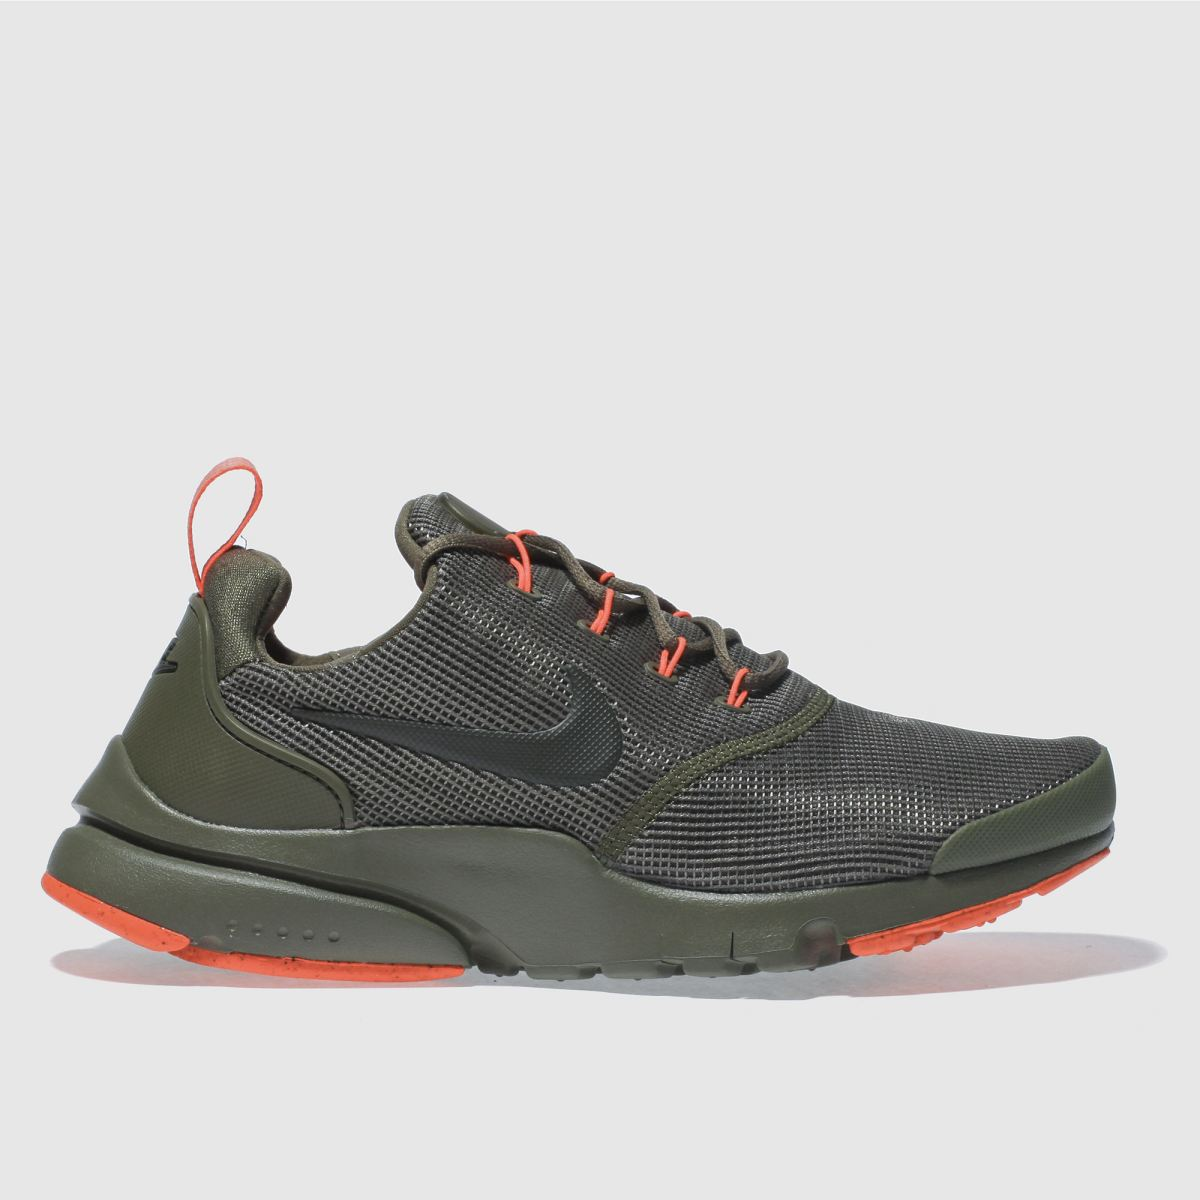 Nike Khaki Presto Fly Youth Trainers